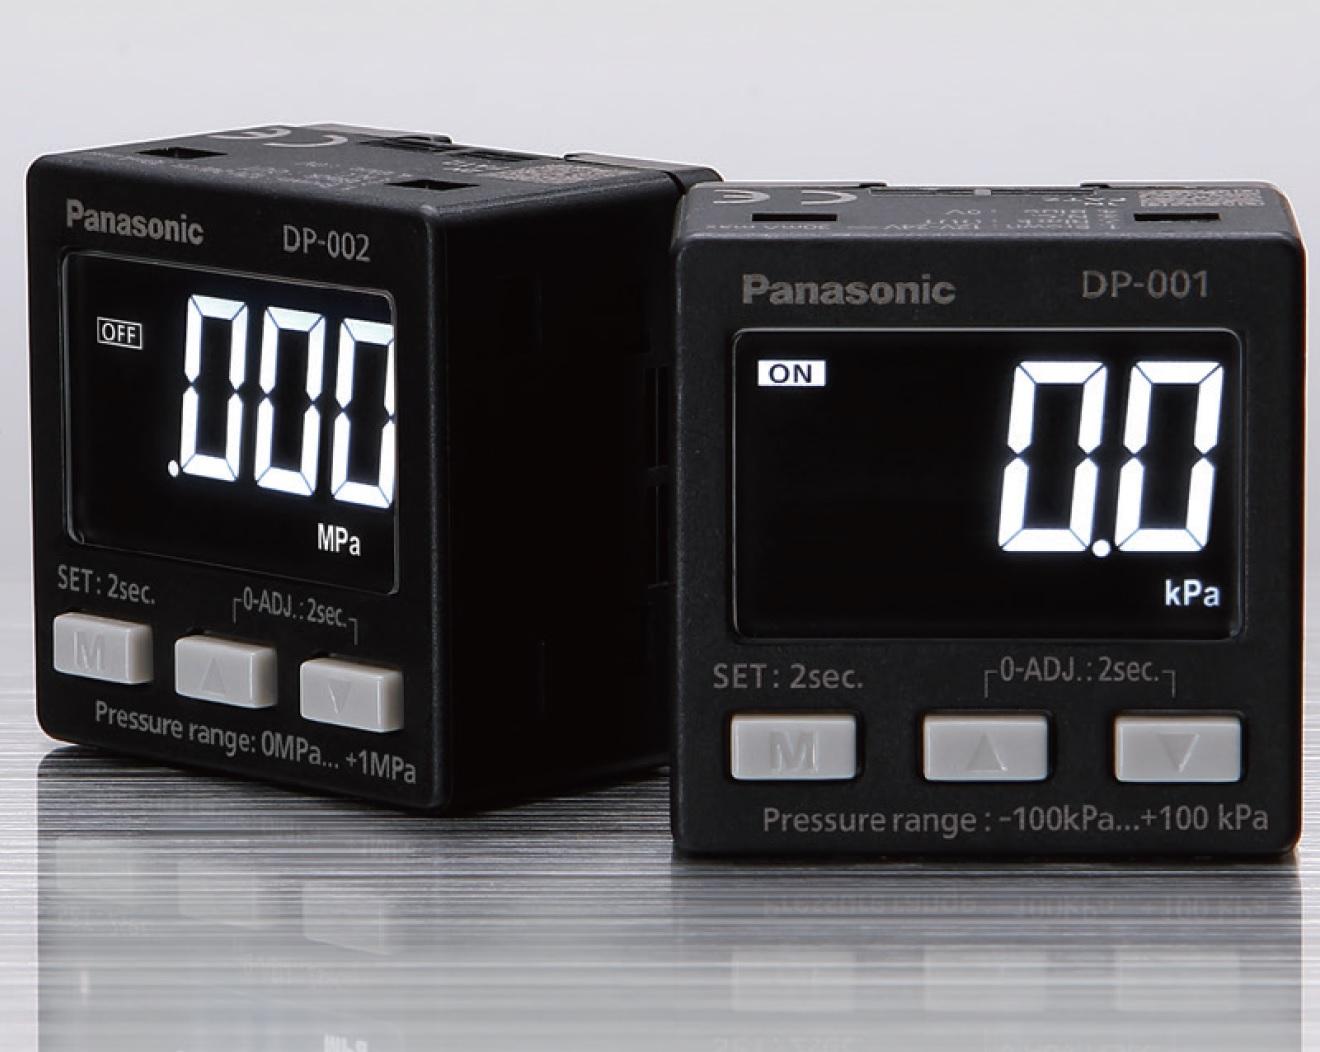 PANASONIC / SUNX DP-0 SERIES เครื่องวัดและควบคุมความดันลม แบบดิจิตอล